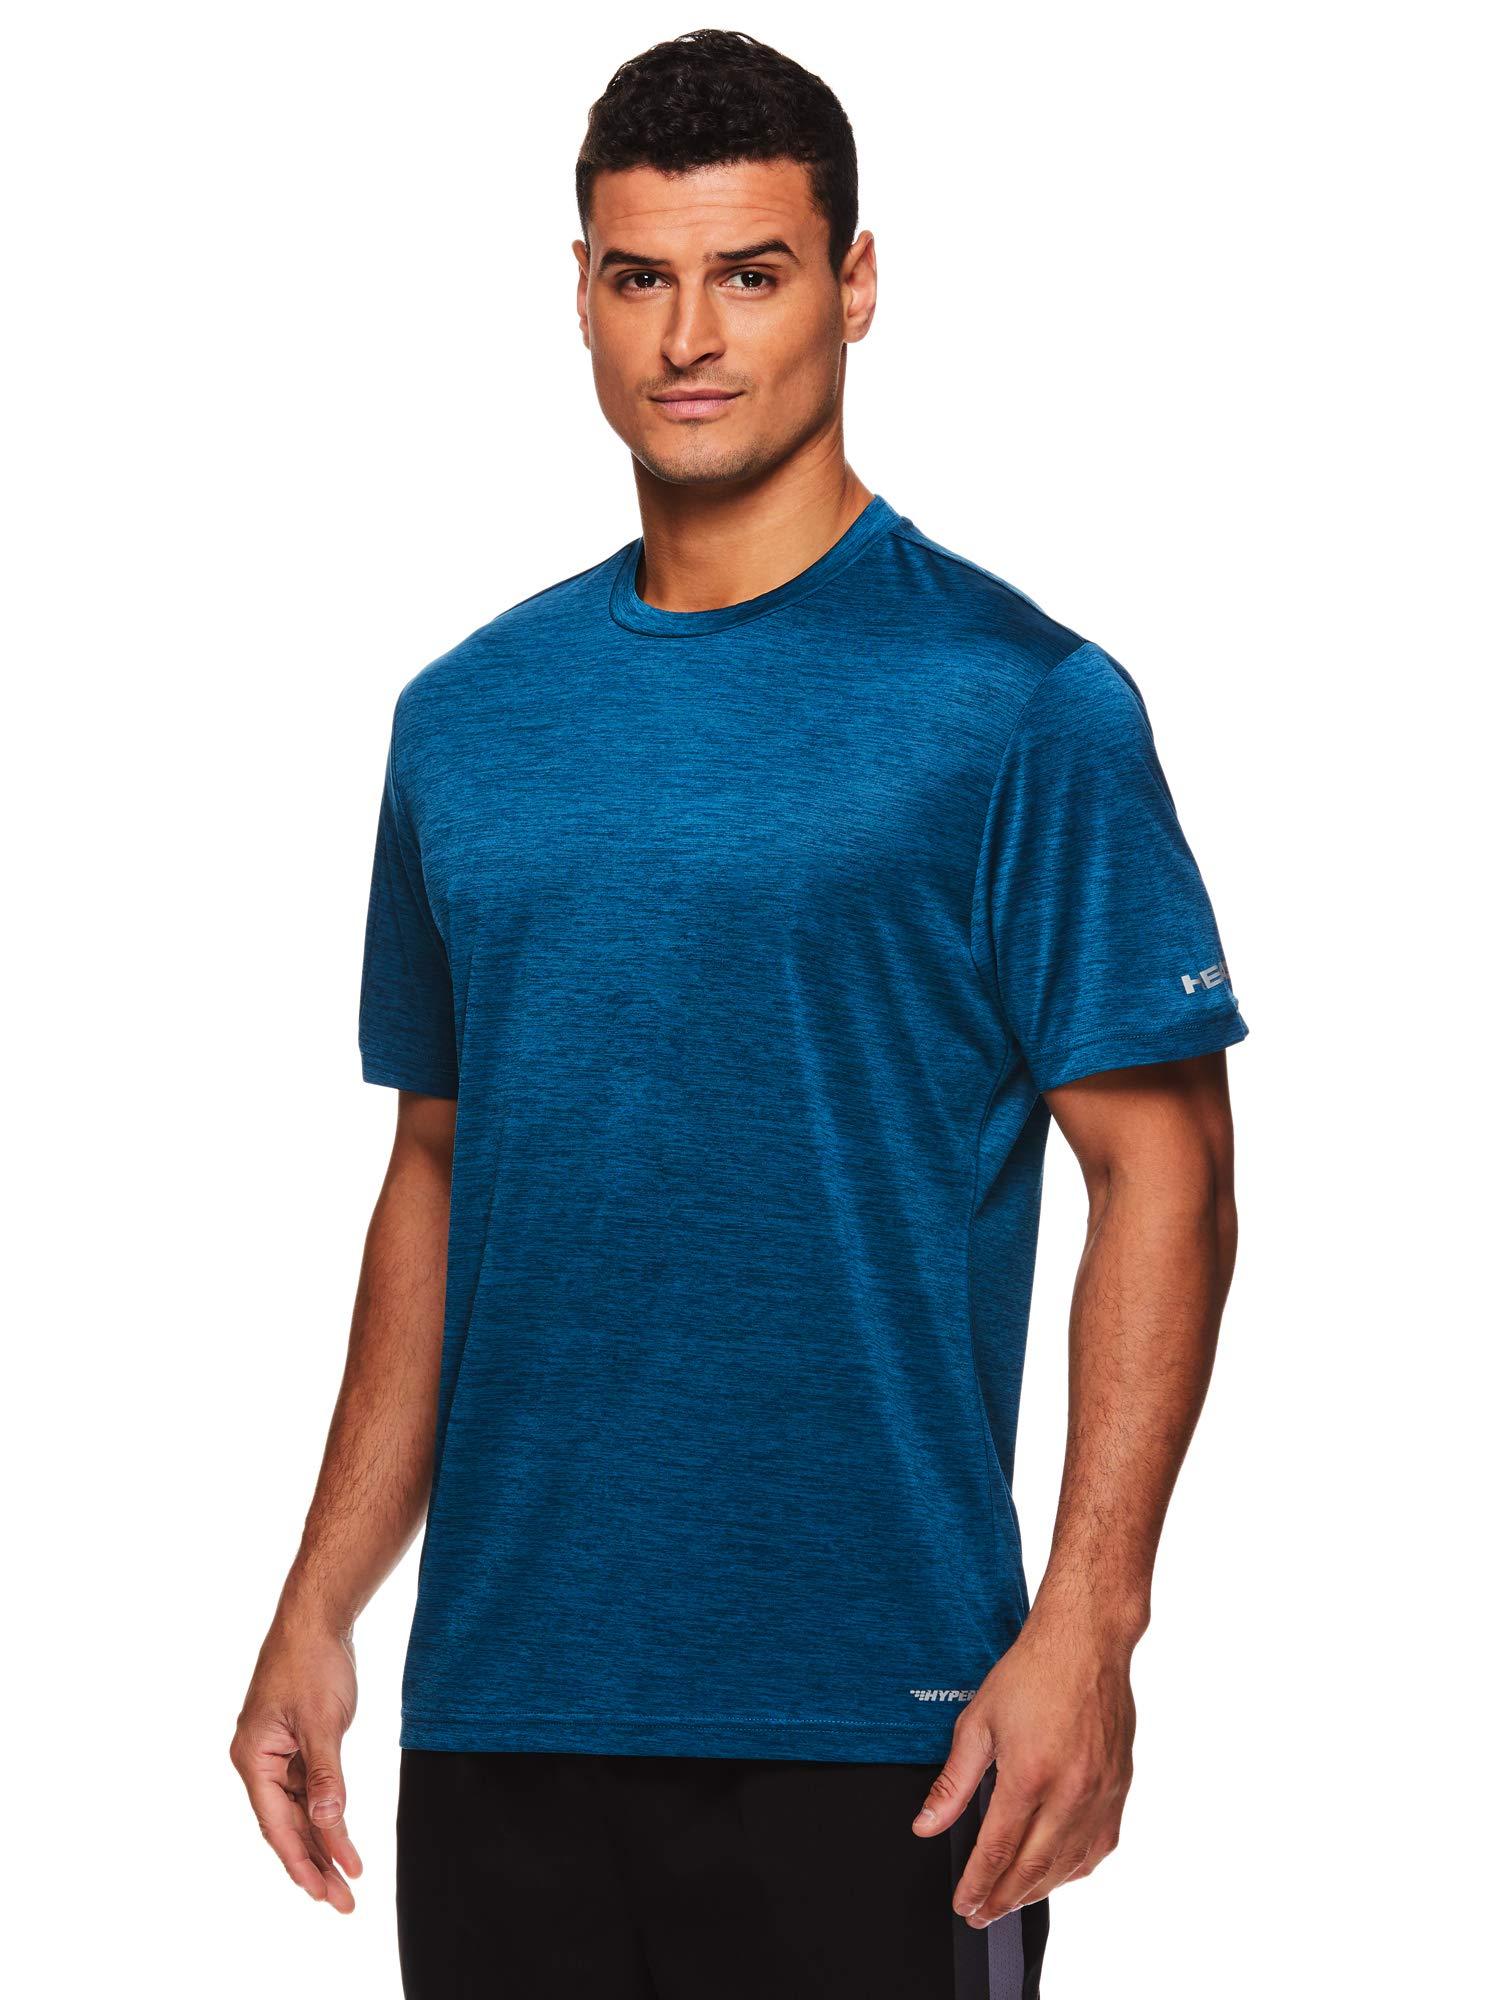 HEAD Men's Ultra Hypertek Crewneck Gym Training & Workout T-Shirt - Short Sleeve Activewear Top - Ultra Lyons Blue Heather, Small